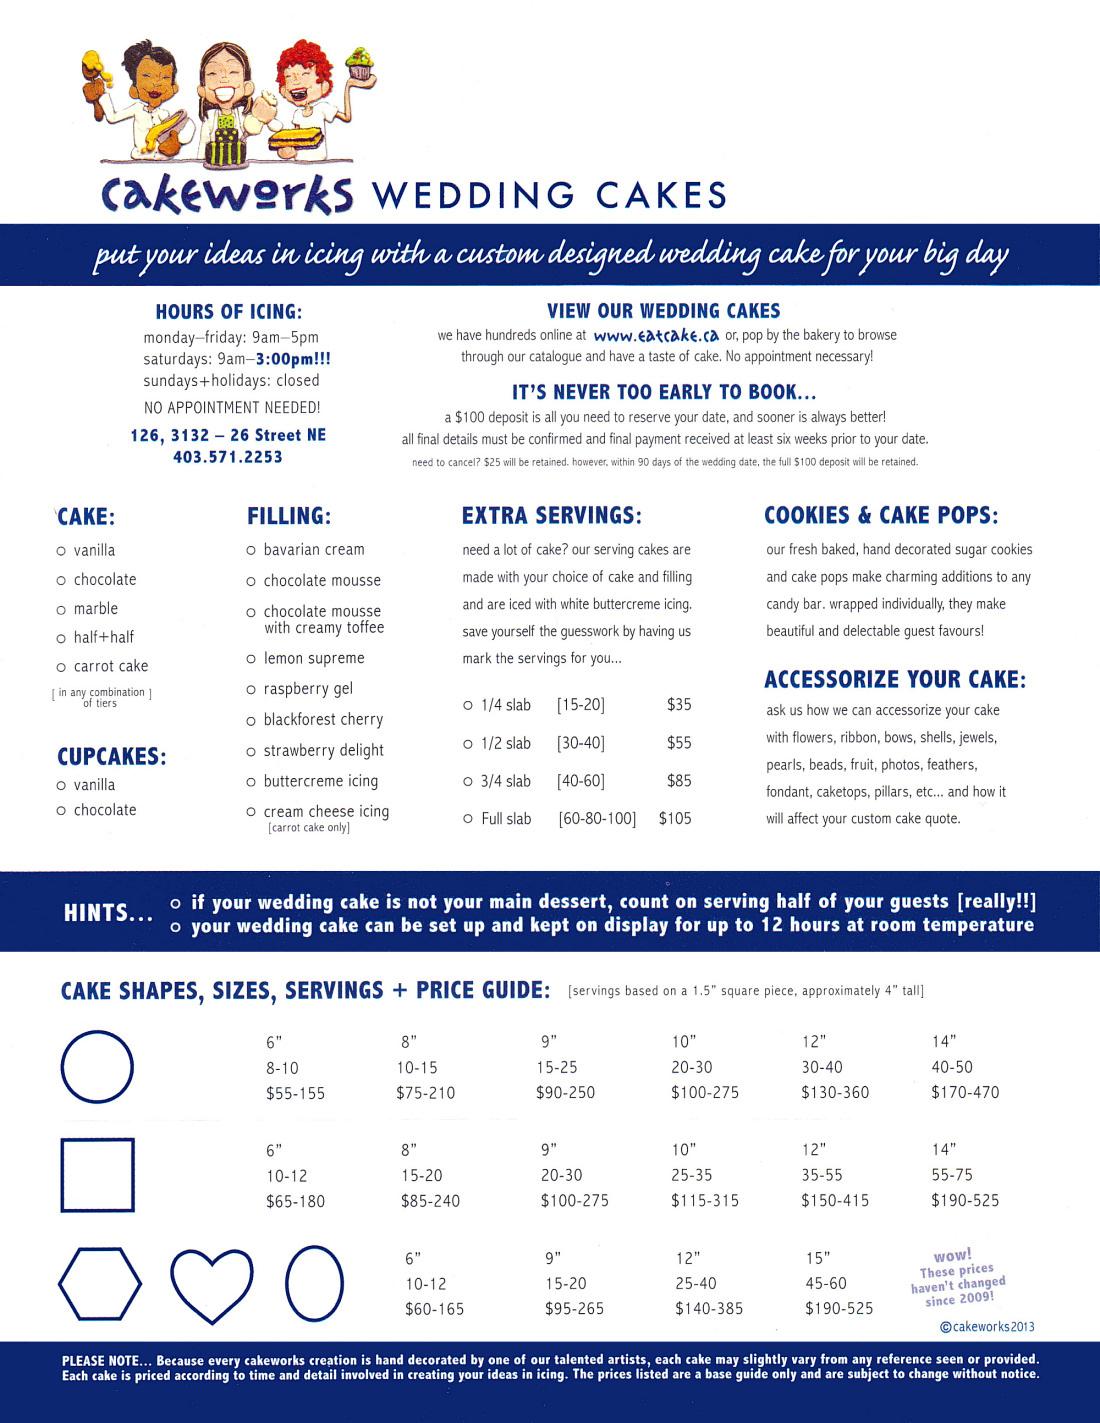 cakeworks inc wedding cake questions faq calgary ab. Black Bedroom Furniture Sets. Home Design Ideas